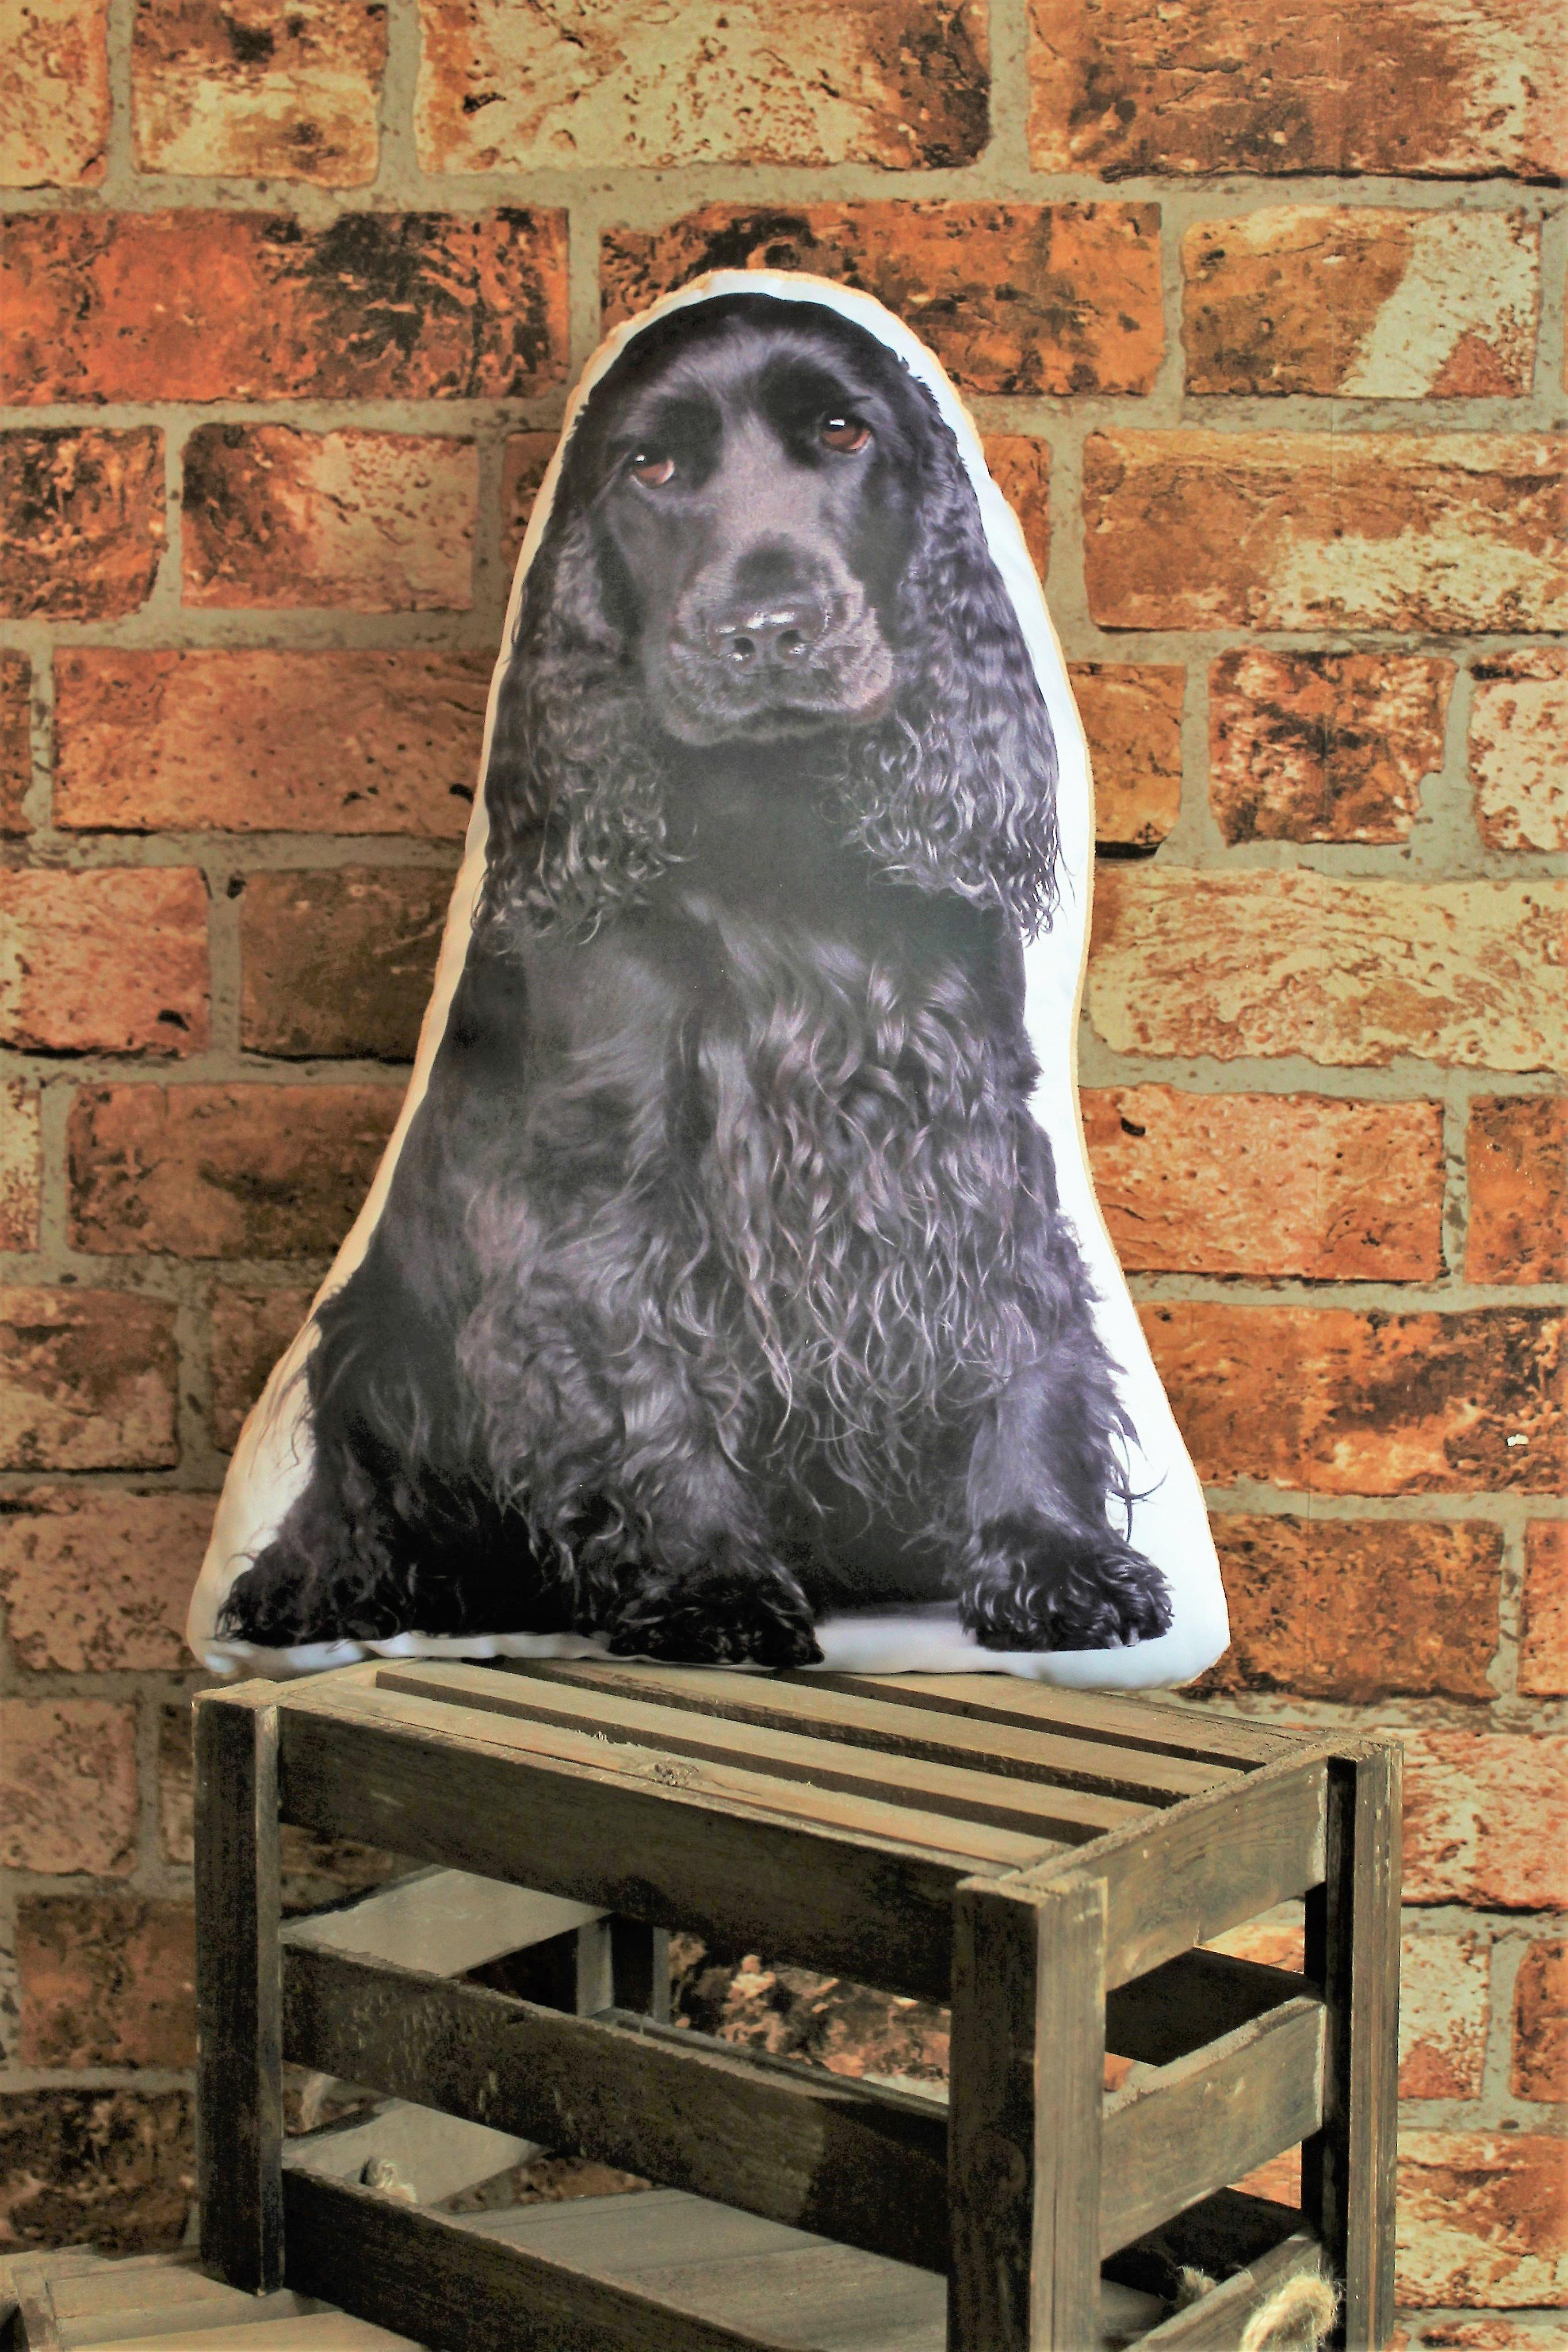 Adorable black cocker spaniel shaped cushion